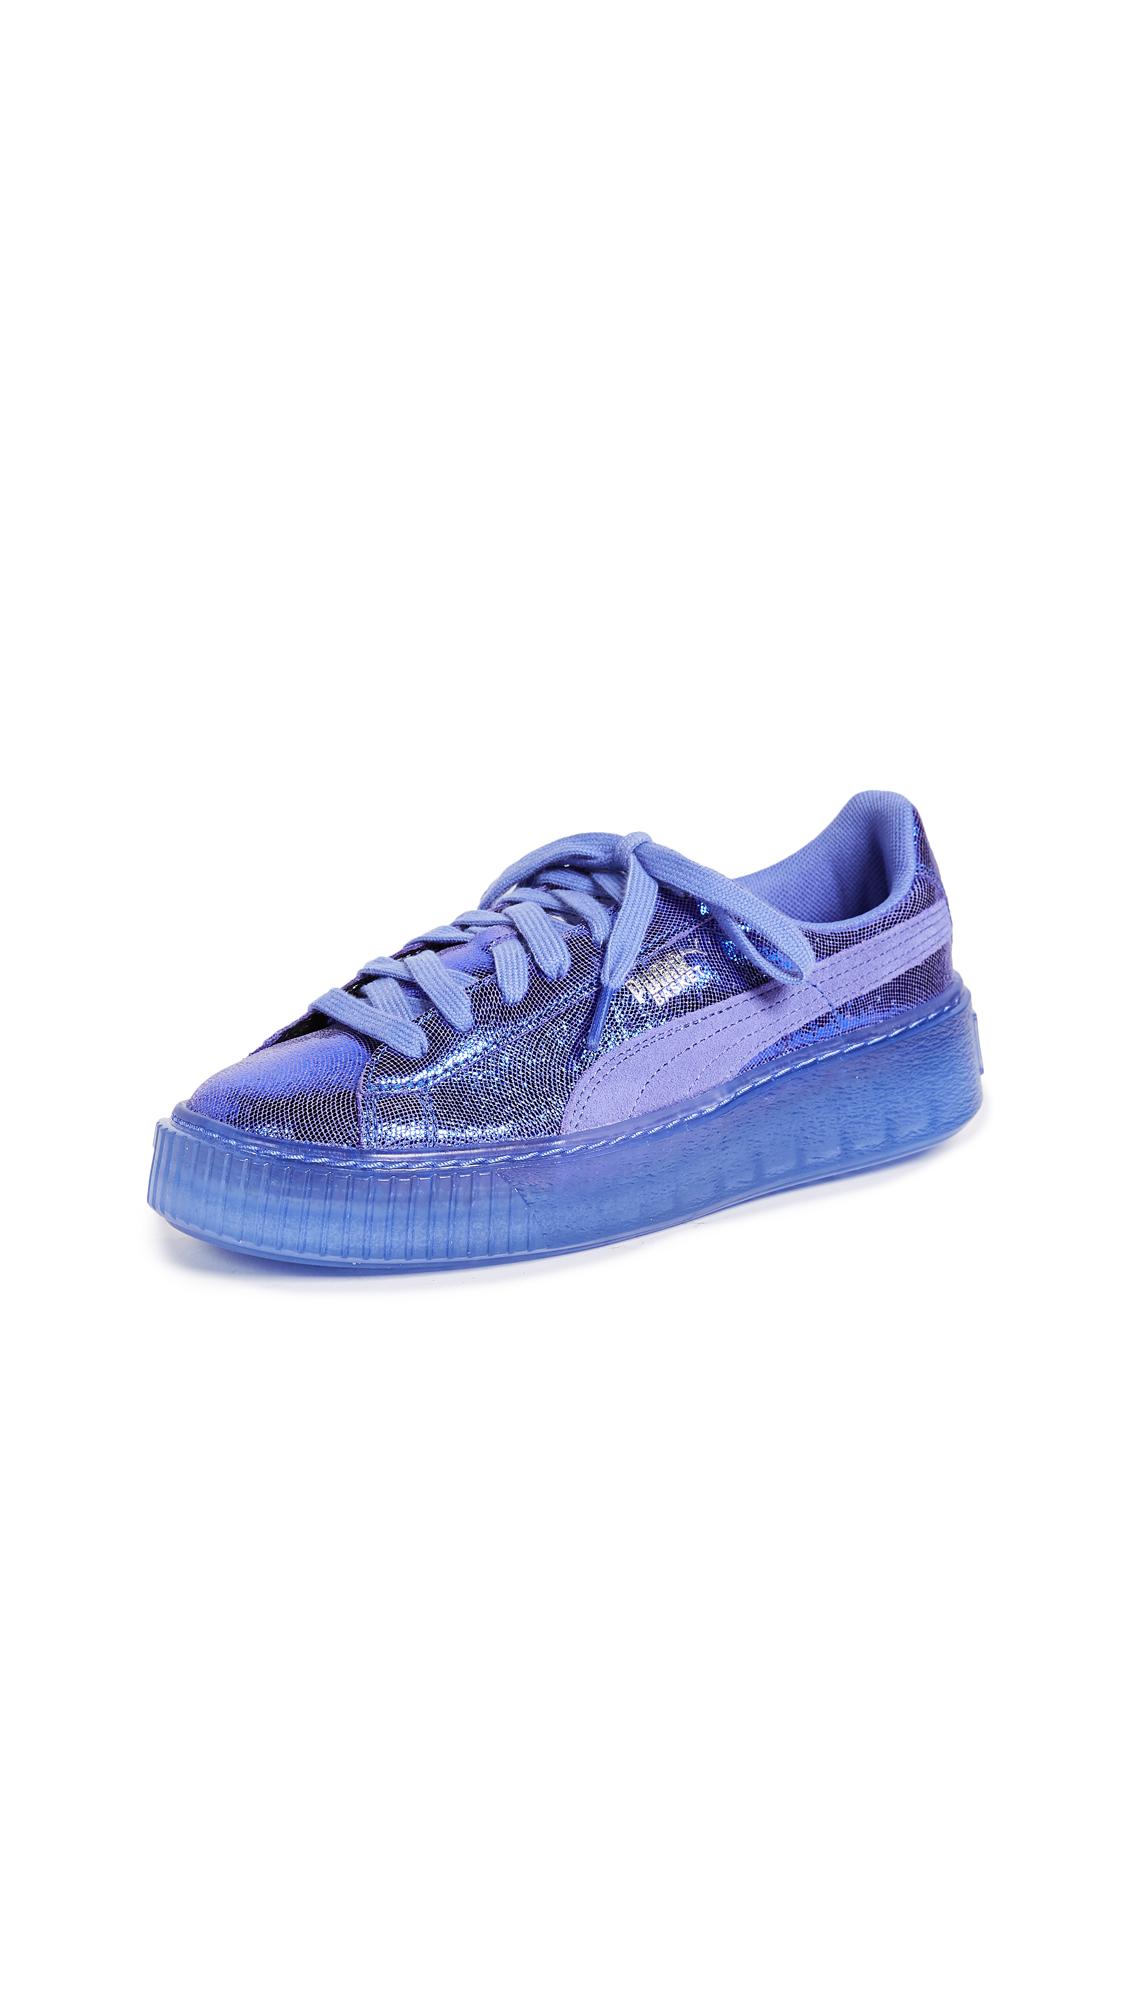 PUMA Basket Platform Sneakers - Baja Blue/Baja Blue